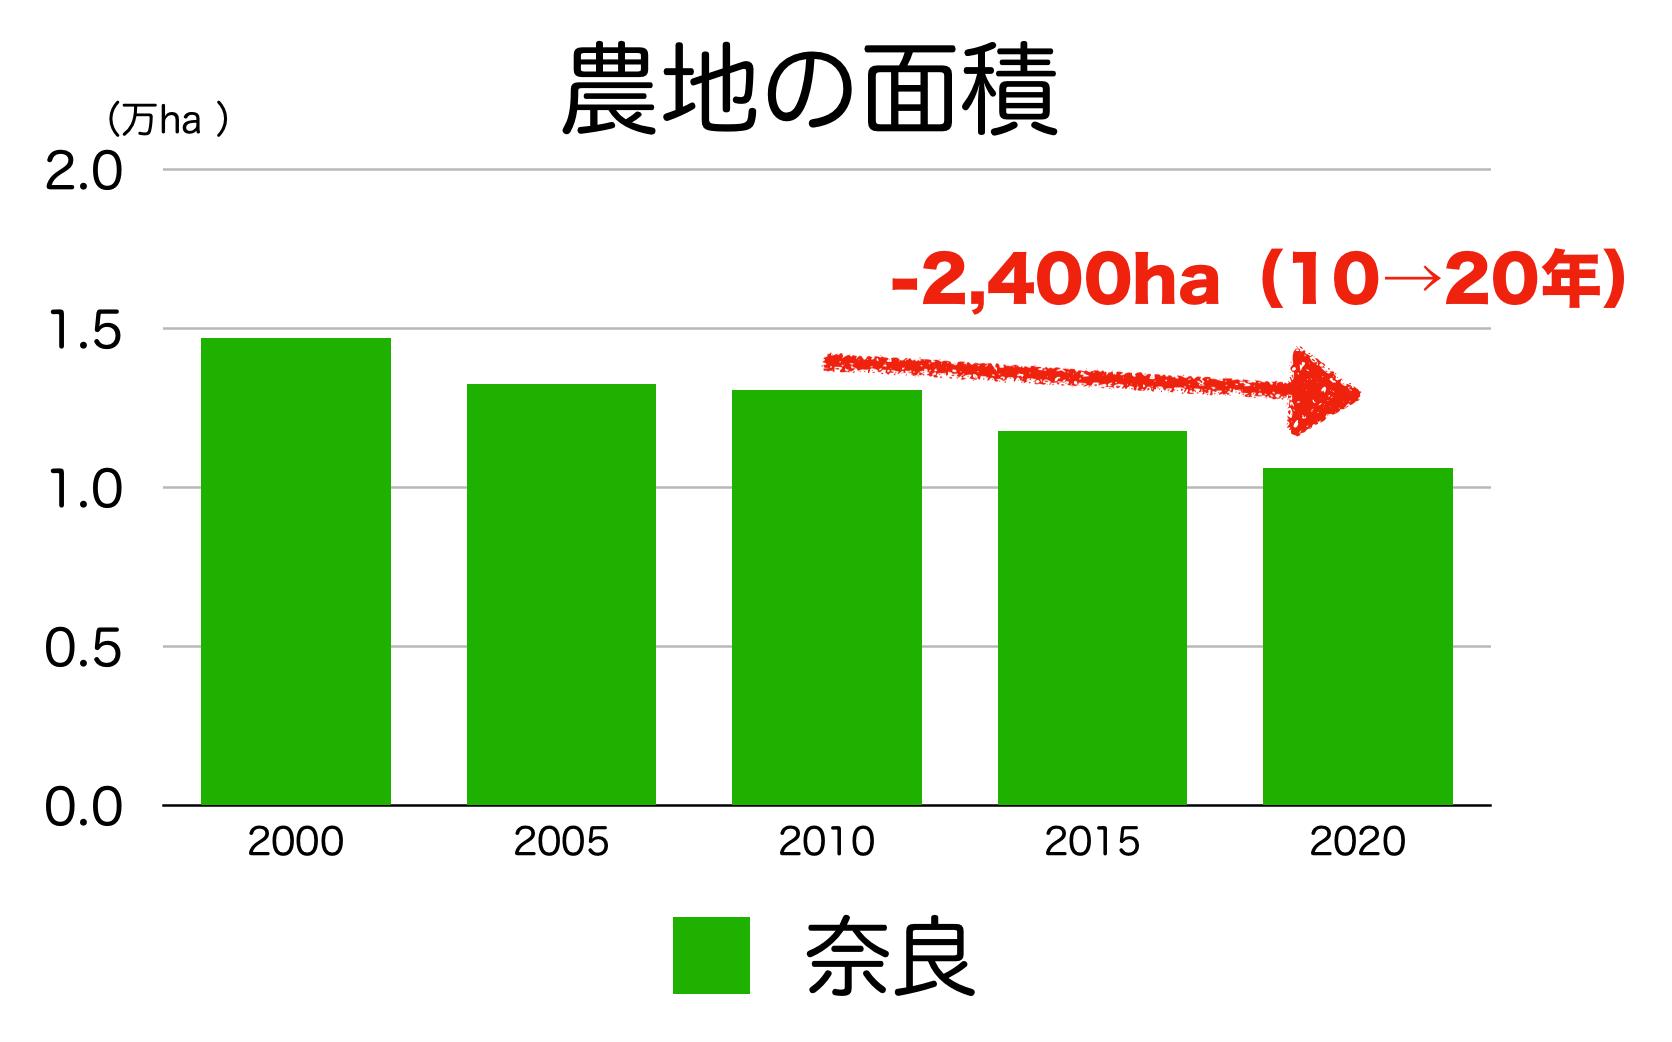 奈良県の農地面積